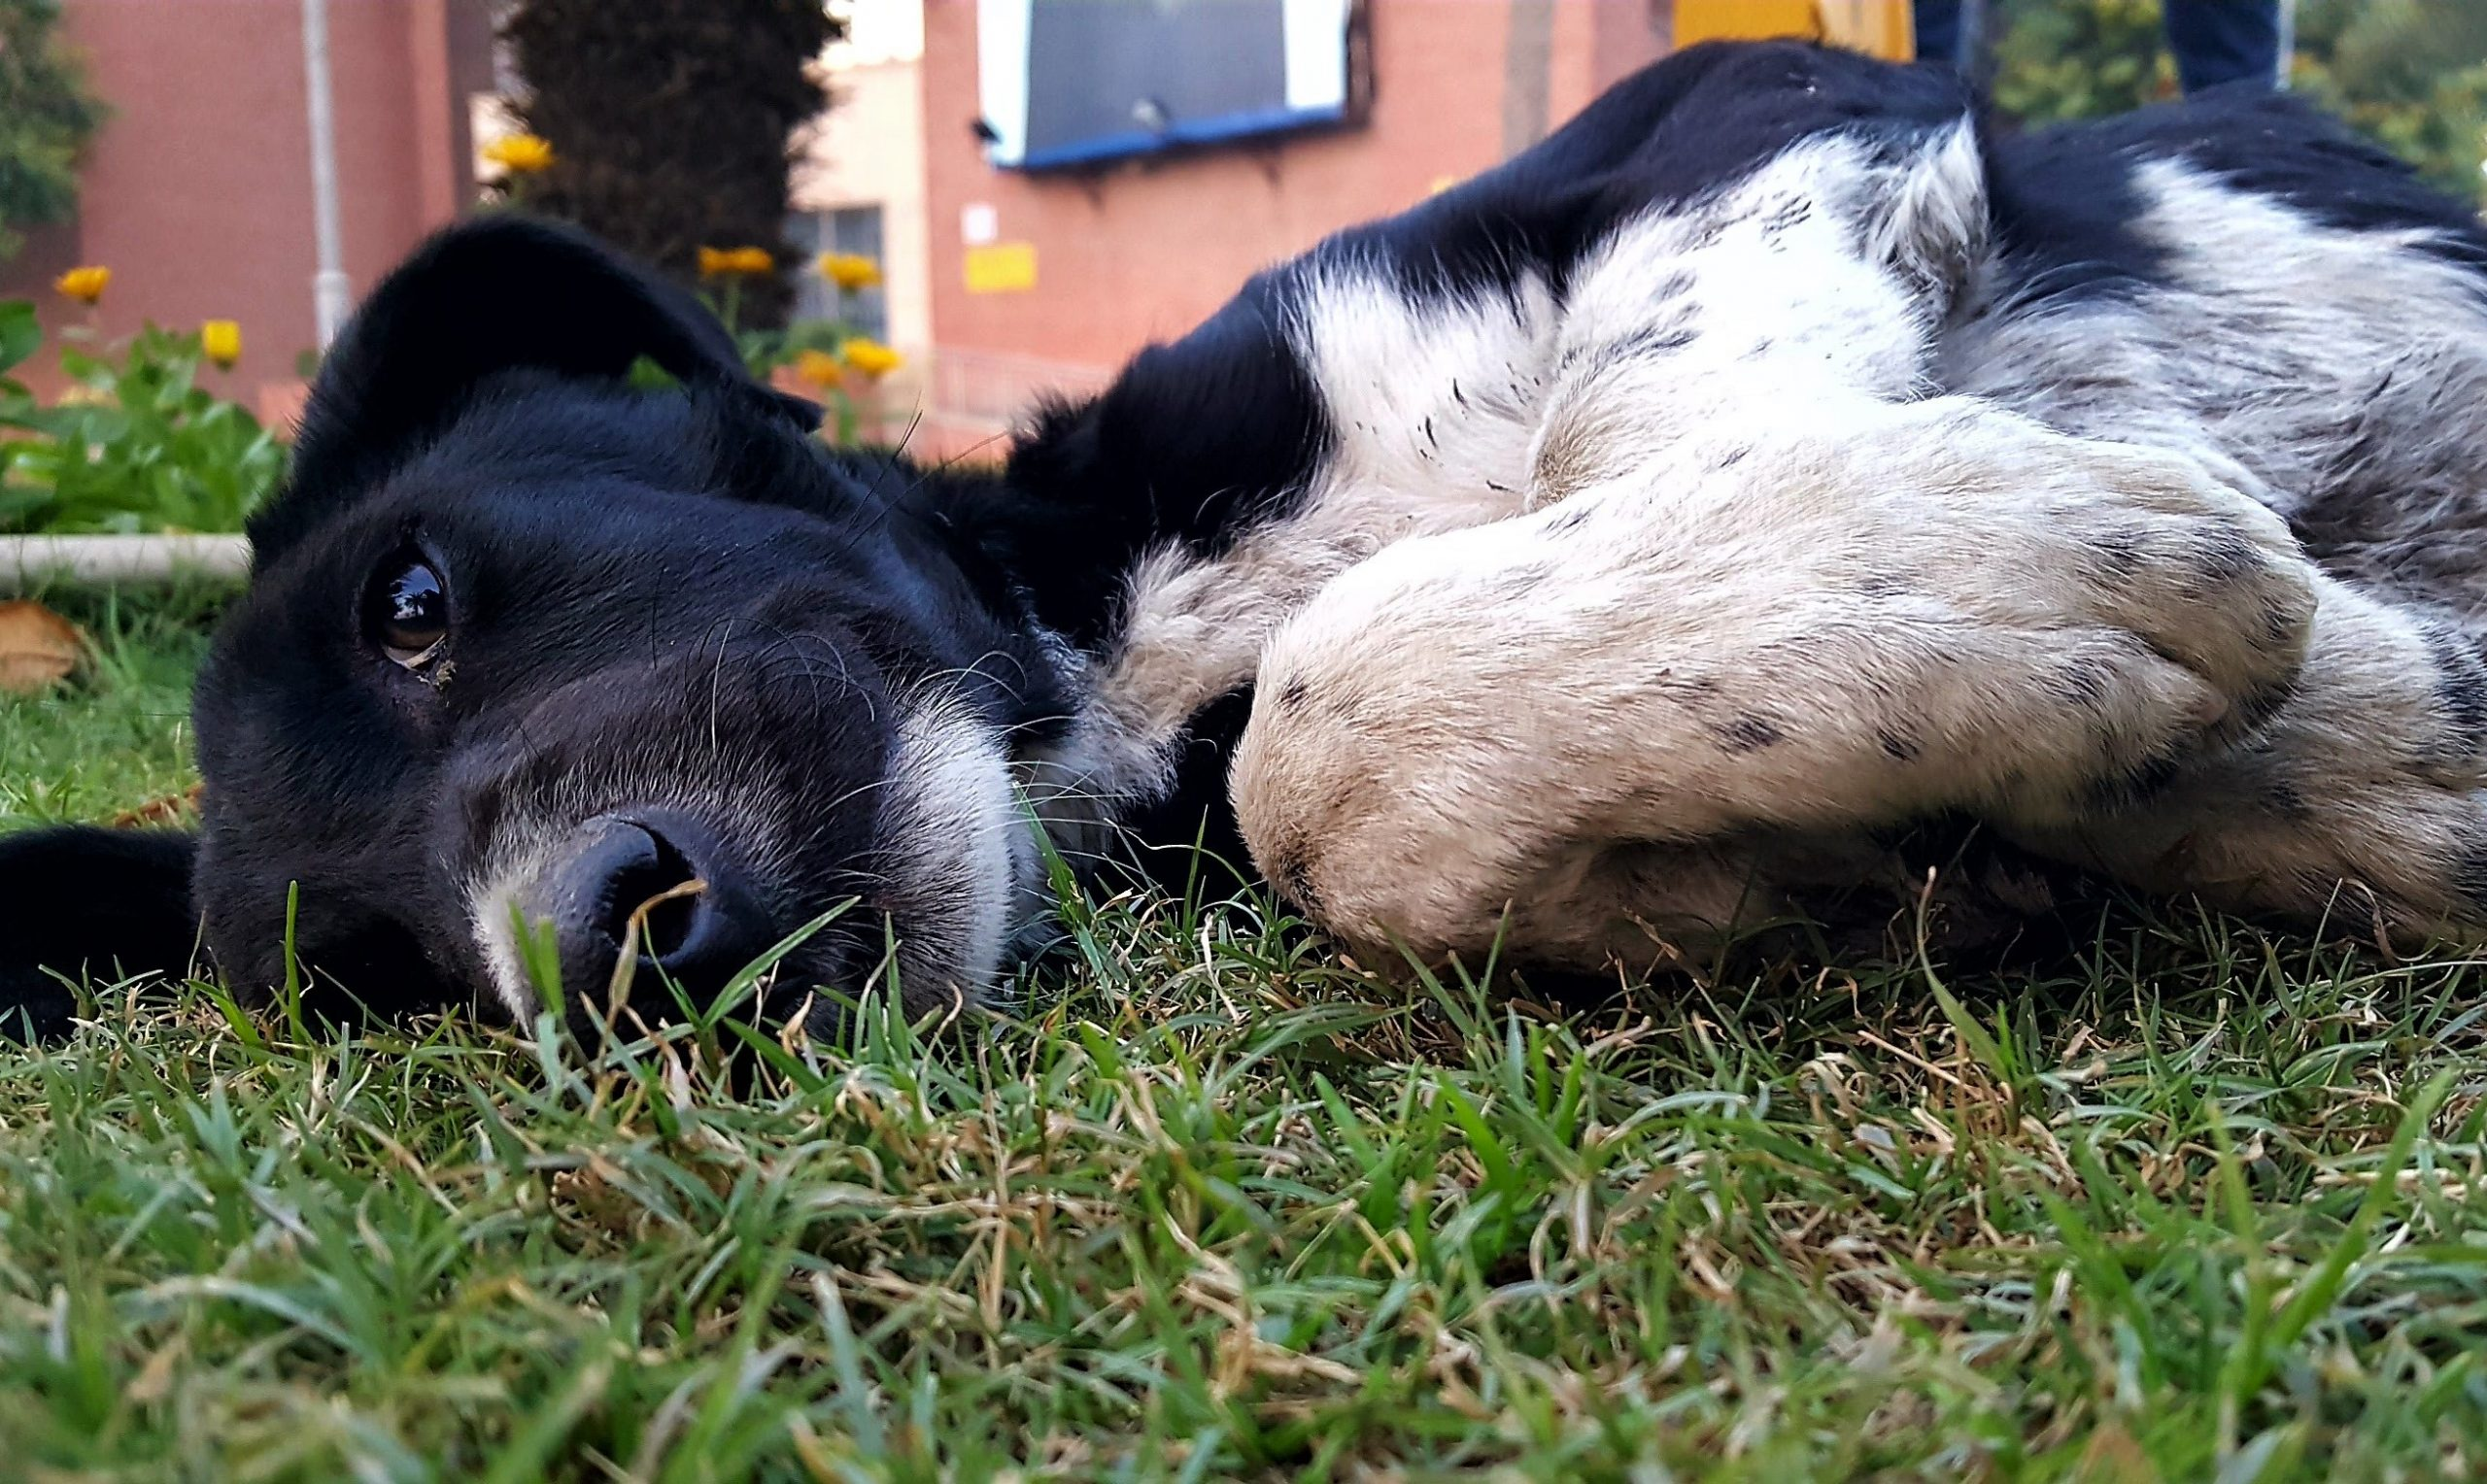 Street dog lying on grass